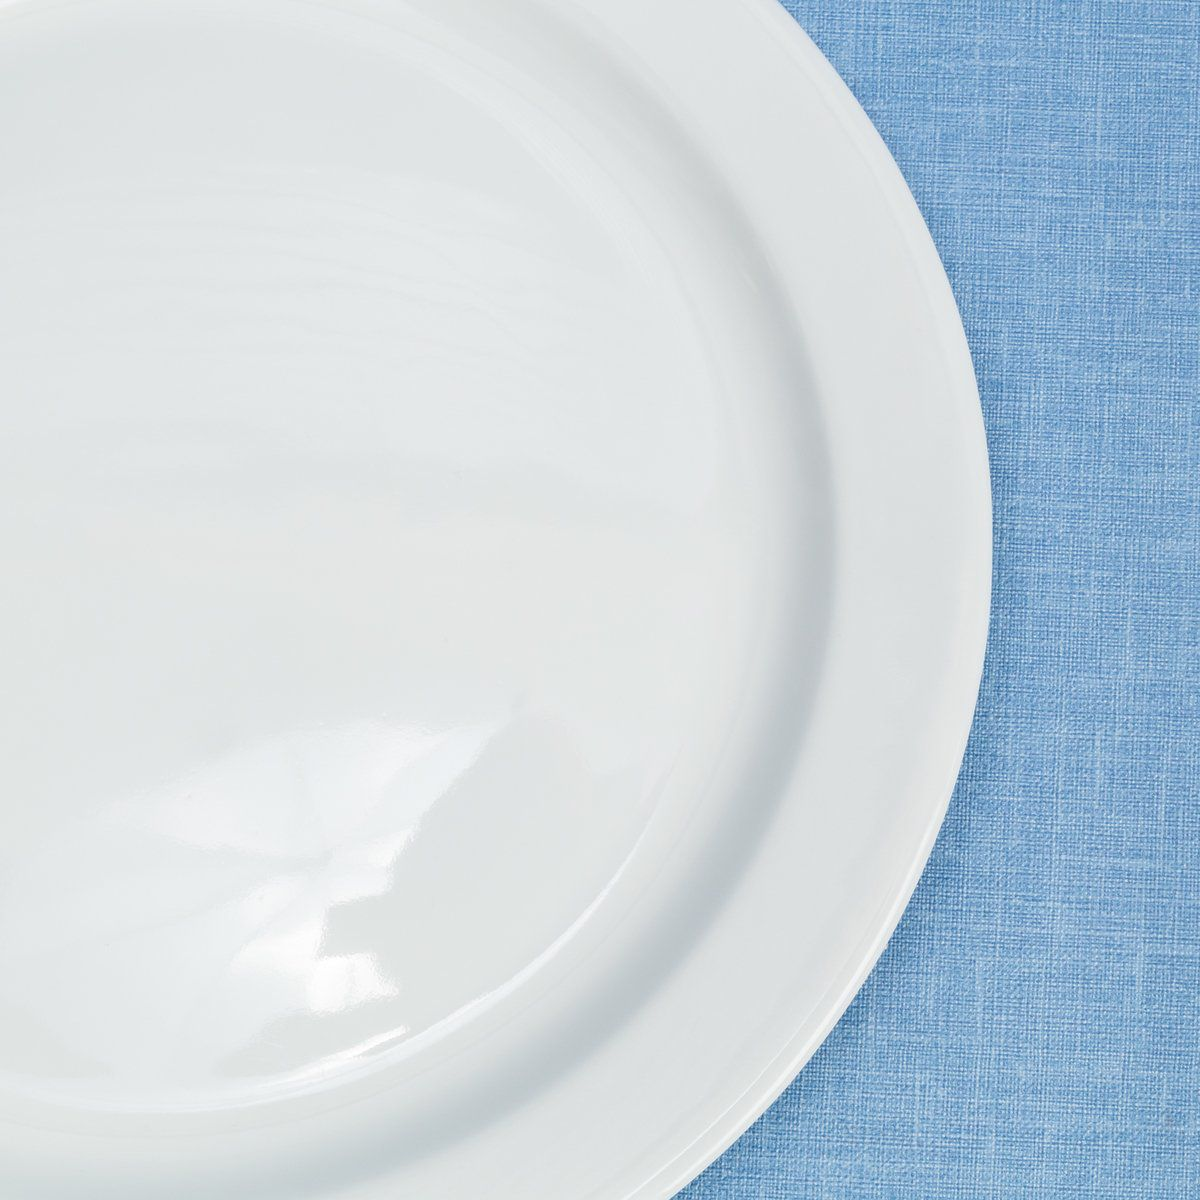 Prato Raso Corona Americana em Porcelana 27cm 8104120152